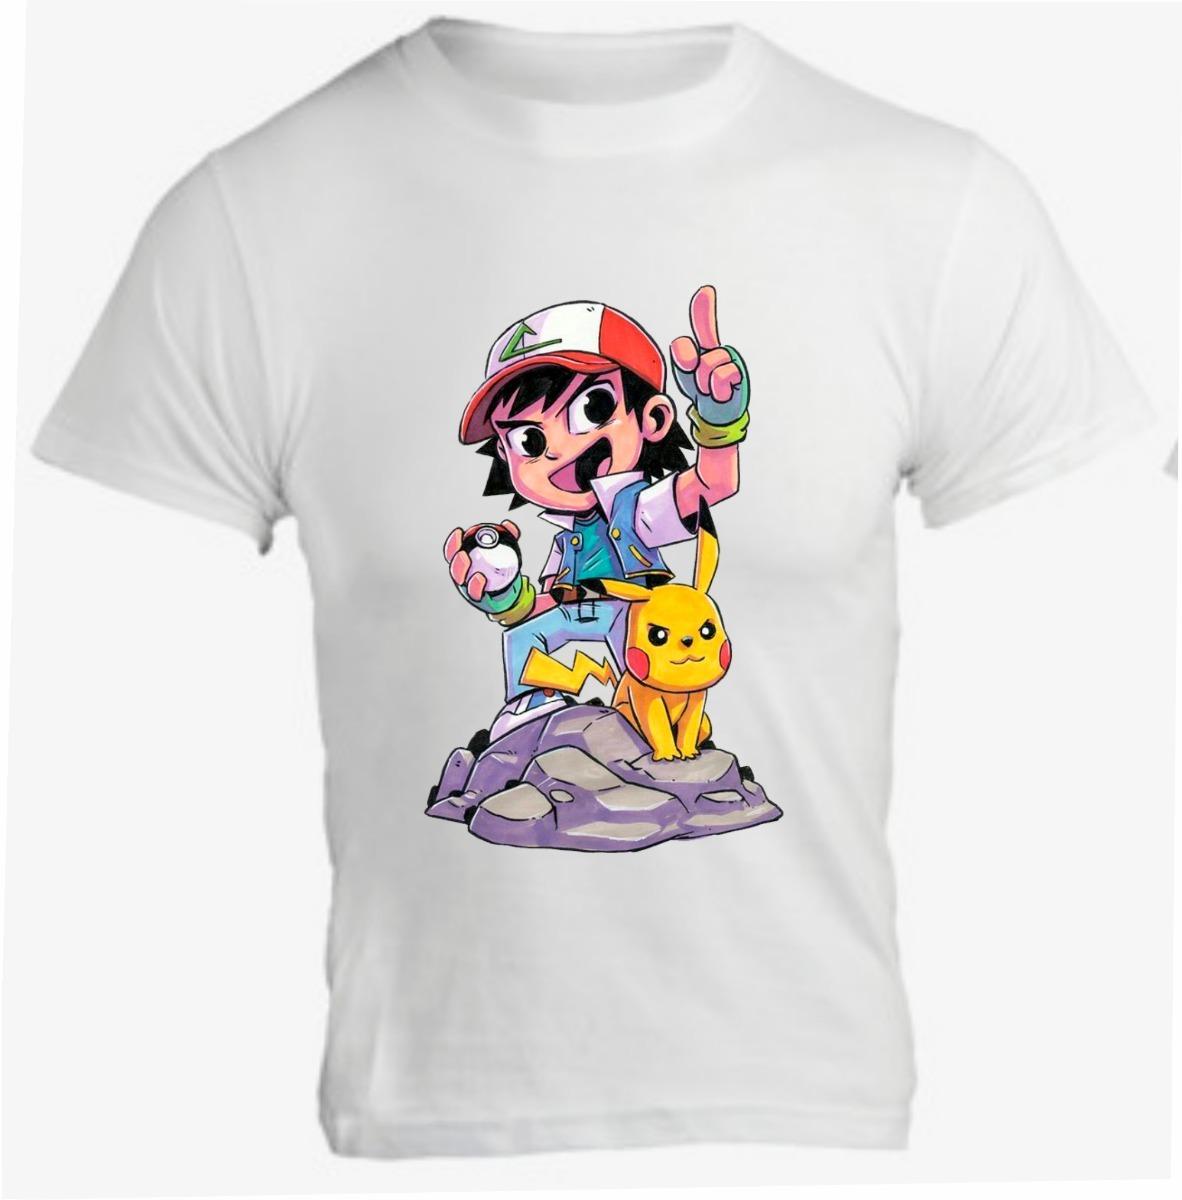 cd3ae83125 camiseta infantil chibi anime pokemon ash mod 27. Carregando zoom.